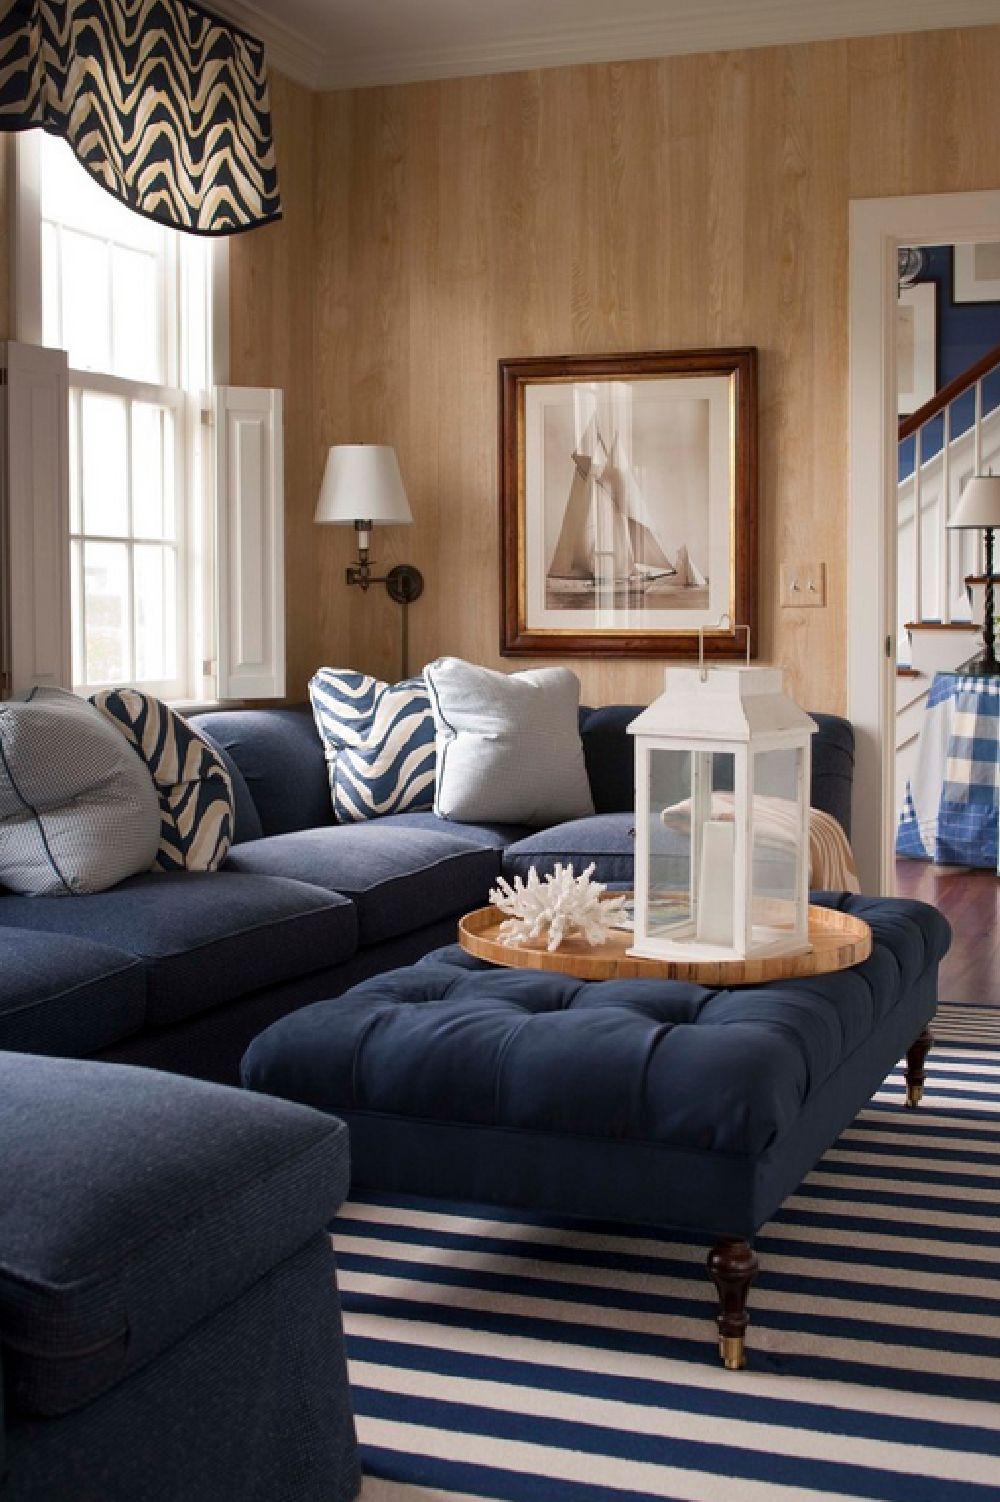 adelaparvu.com despre casa de vacanta in alb si albastru, casa SUA  Nantucket, Design interior T. Keller Donovan, Foto John Bessler Photography (6)